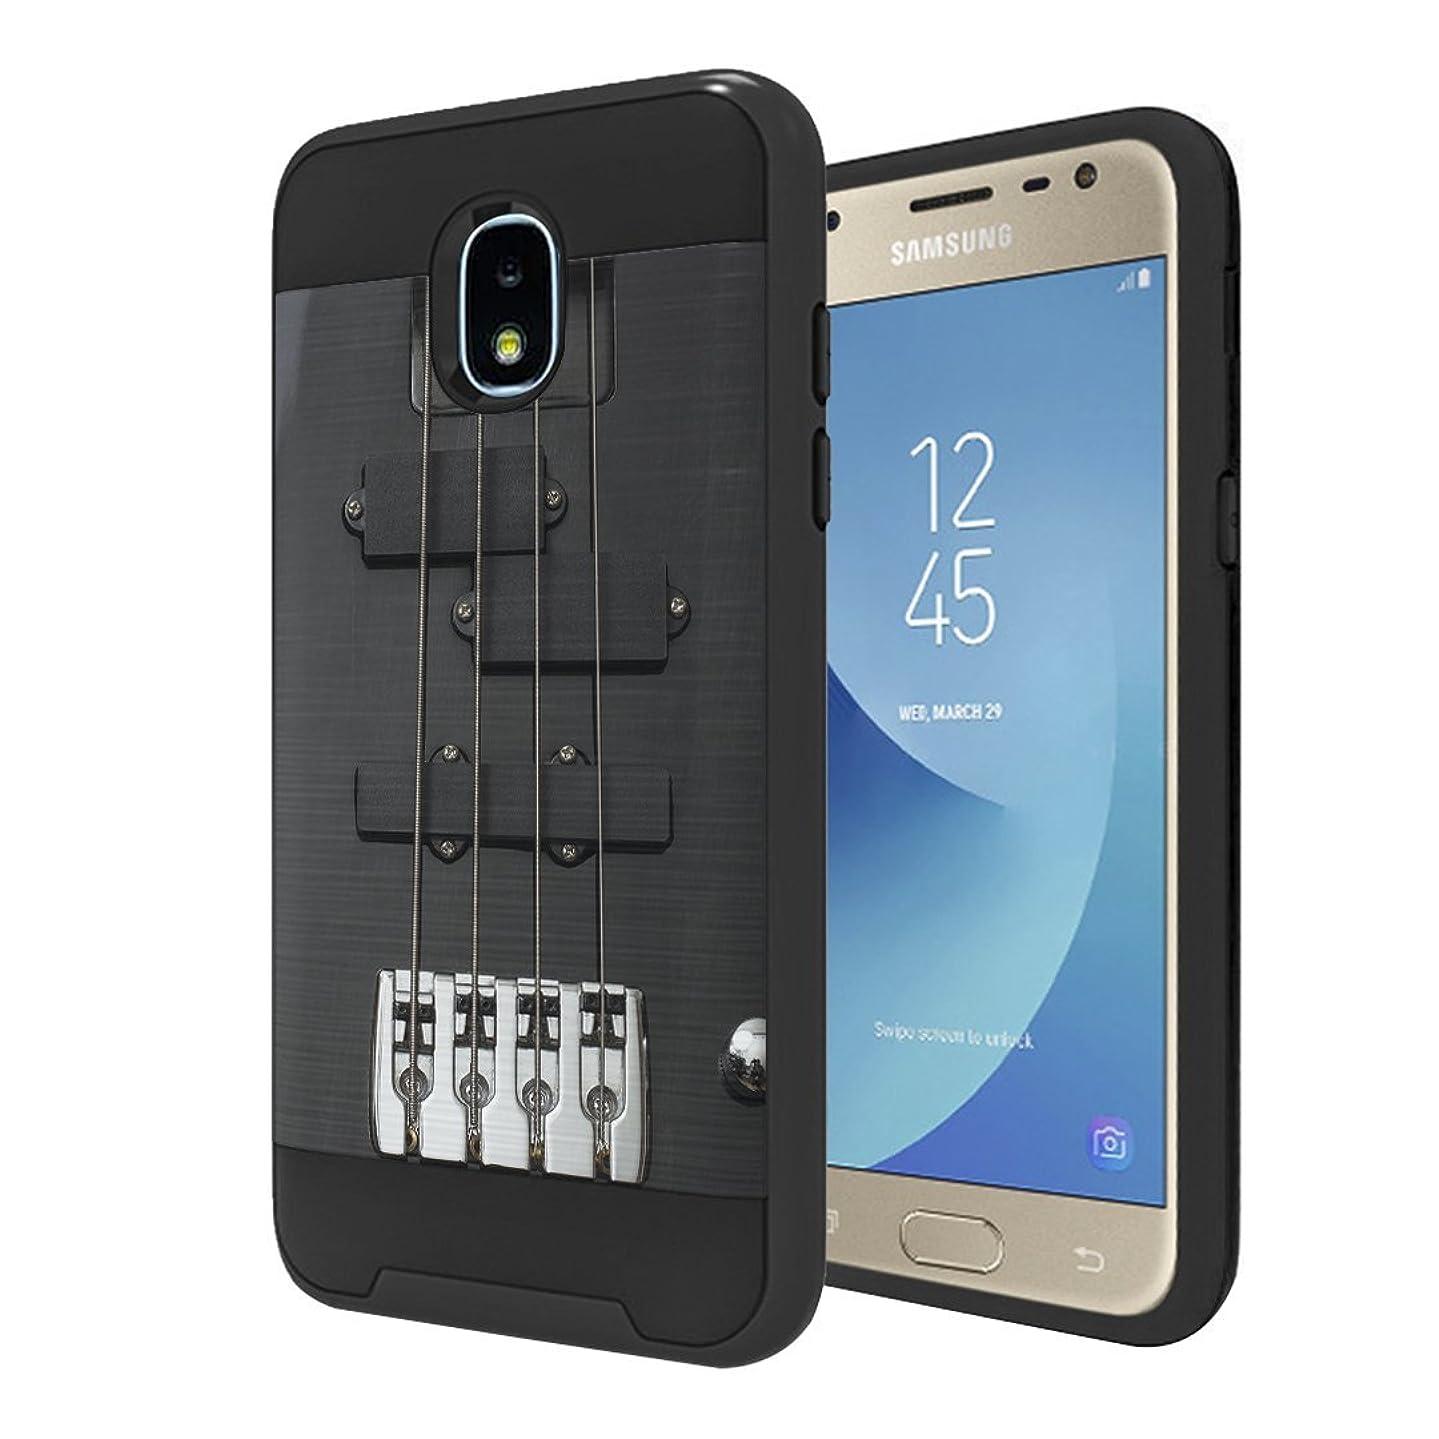 Capsule Case Compatible with Samsung Galaxy J3 2018 (J337), J3 Star, Amp Prime 3, Express Prime 3, J3V, J3 Eclipse 2, J3 Achieve, Sol 3, J338 [Hybrid Case Black] - (Black Guitar)